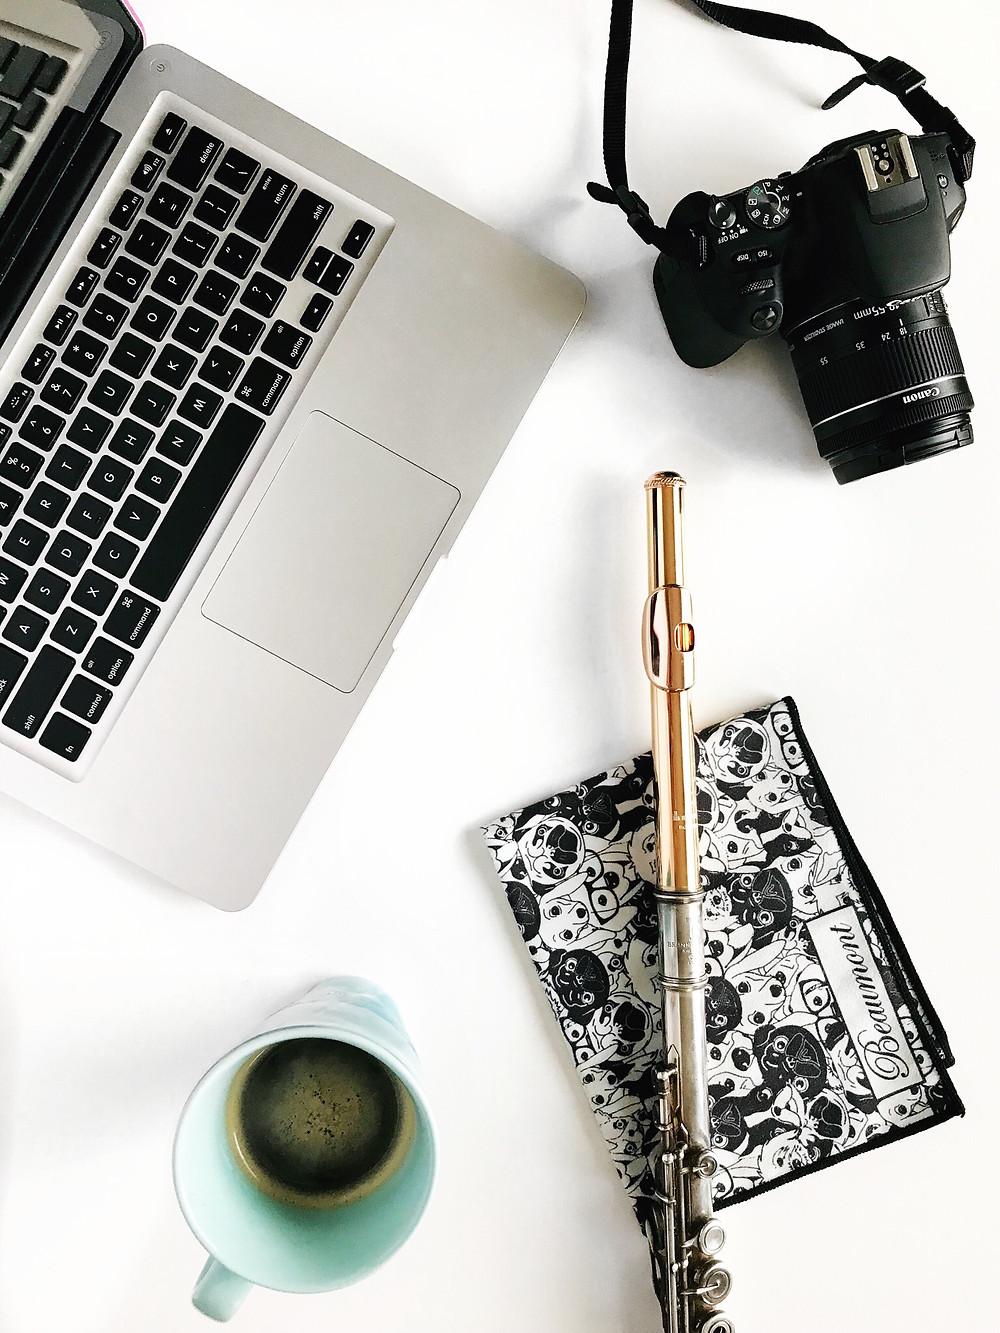 How to take beautiful photos with your phone I phone photography tips I nicolericcardo.com